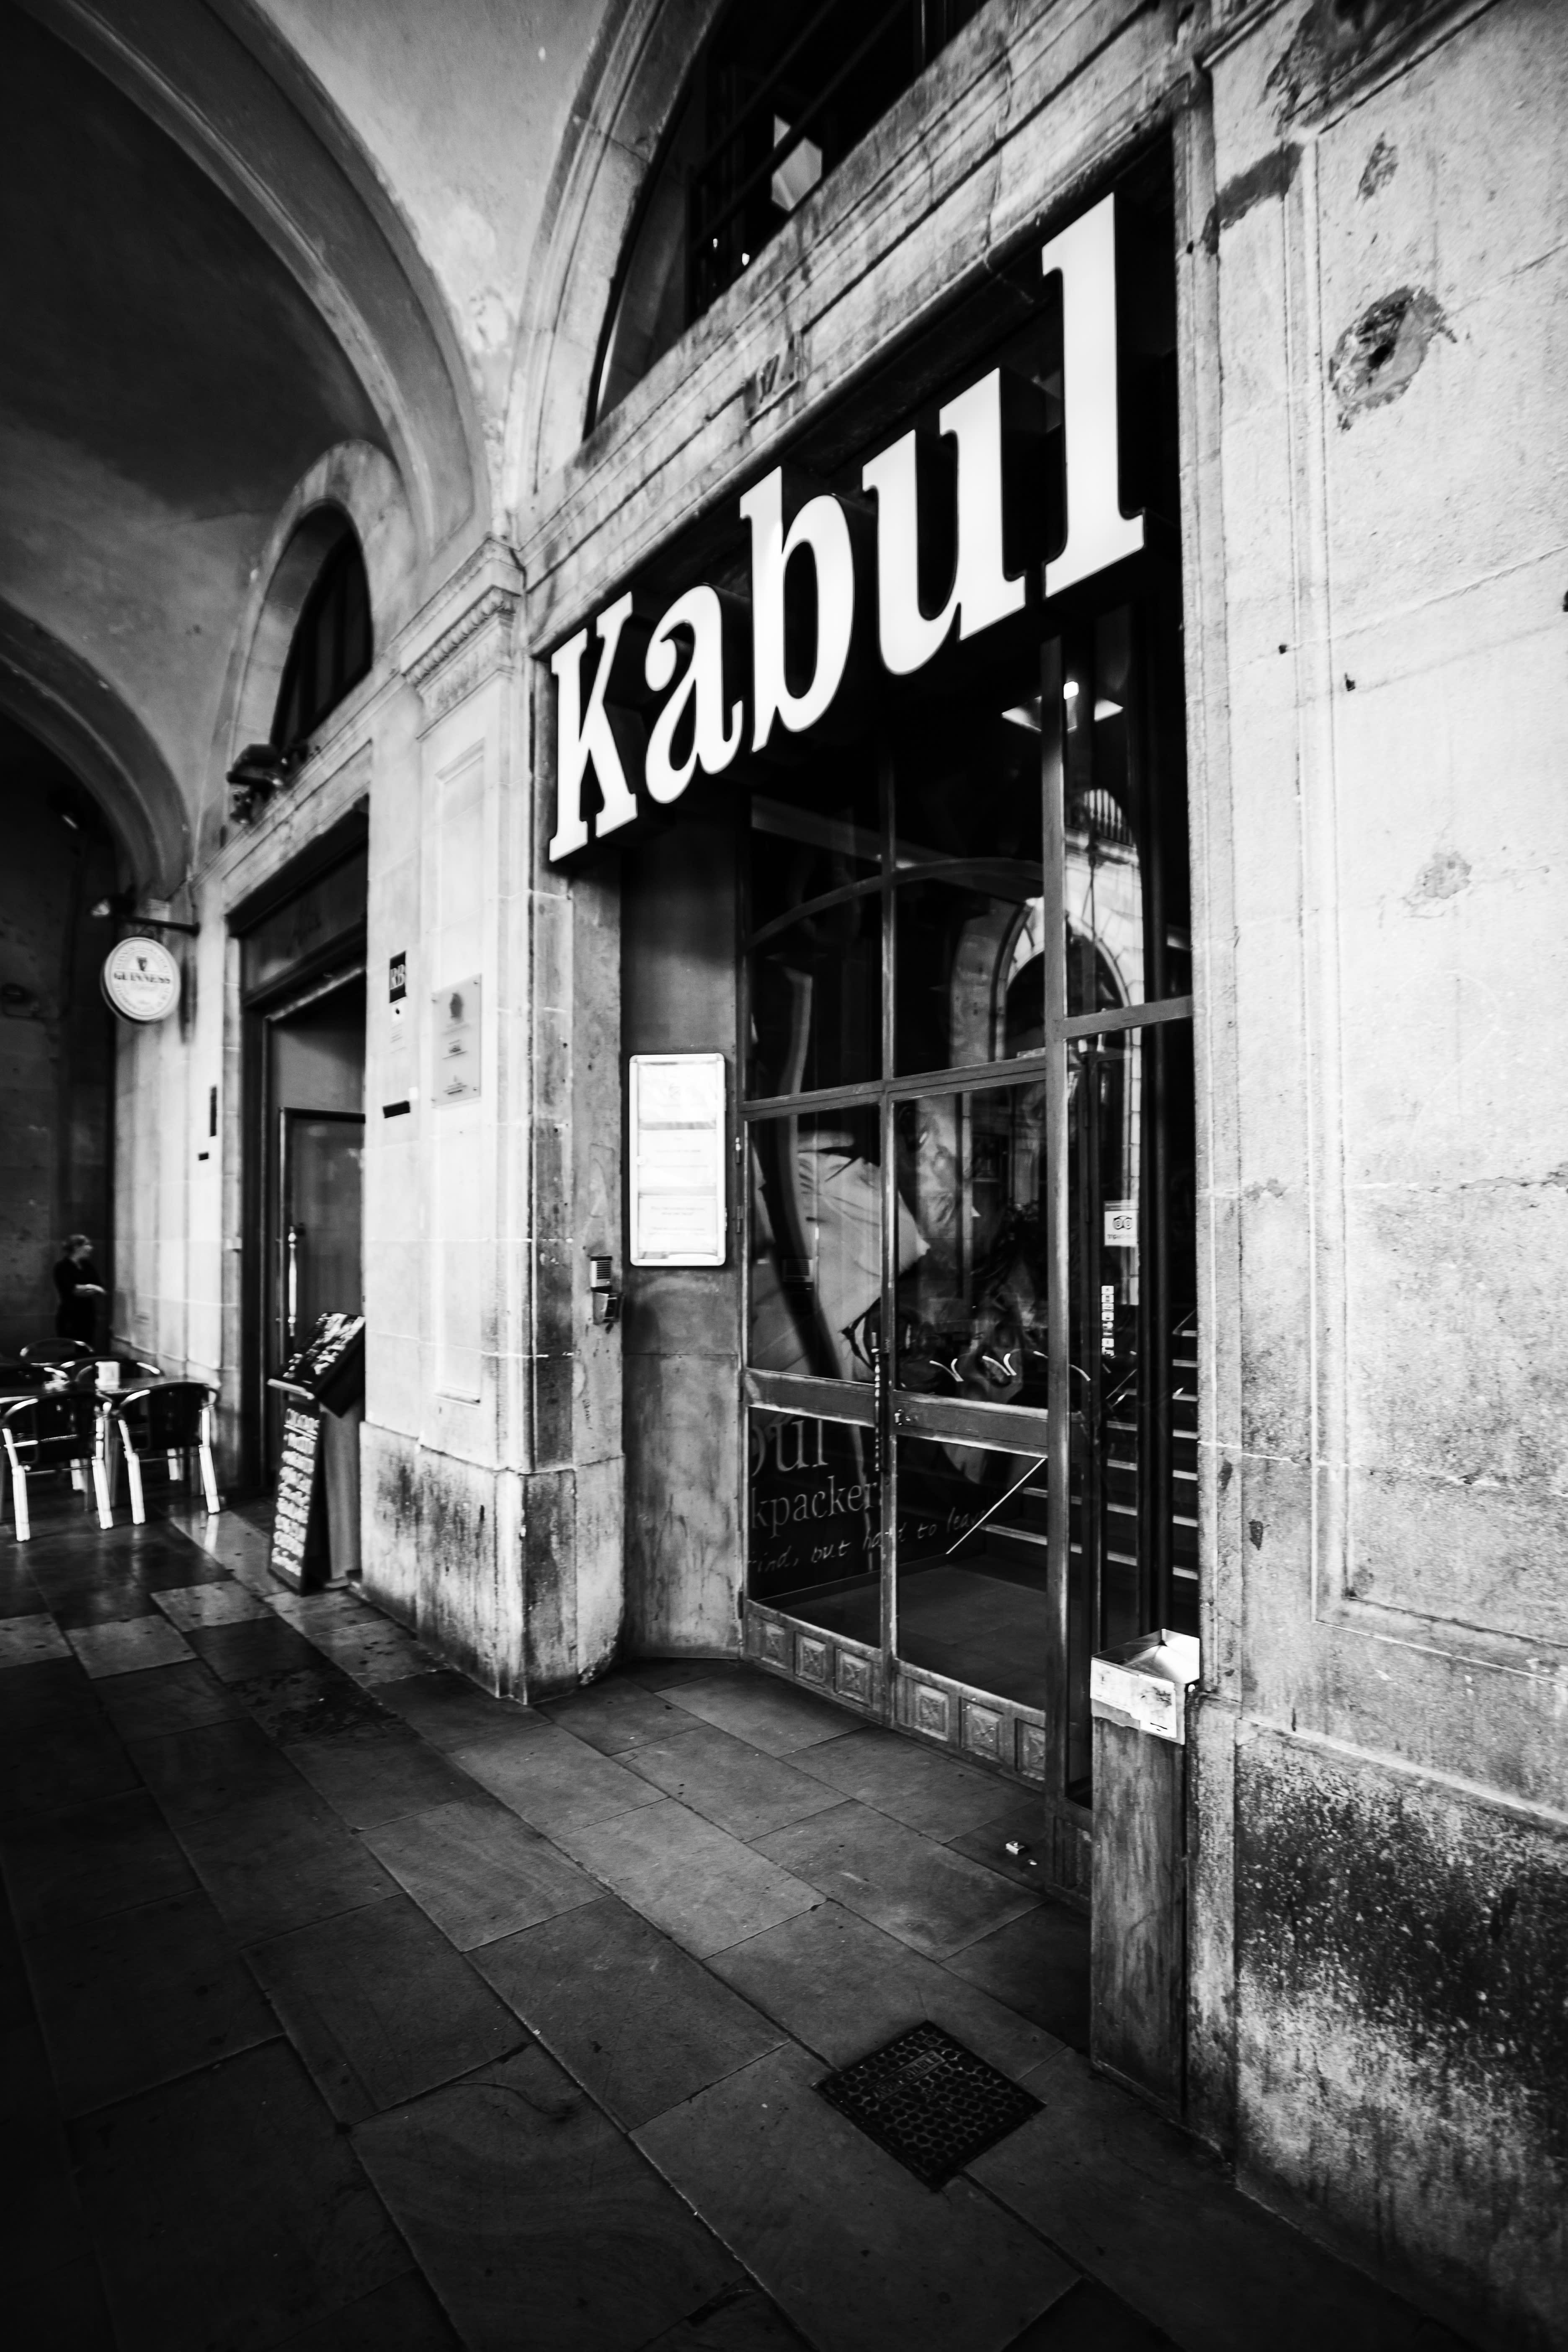 HOSTEL - Kabul Party Hostel Barcelona